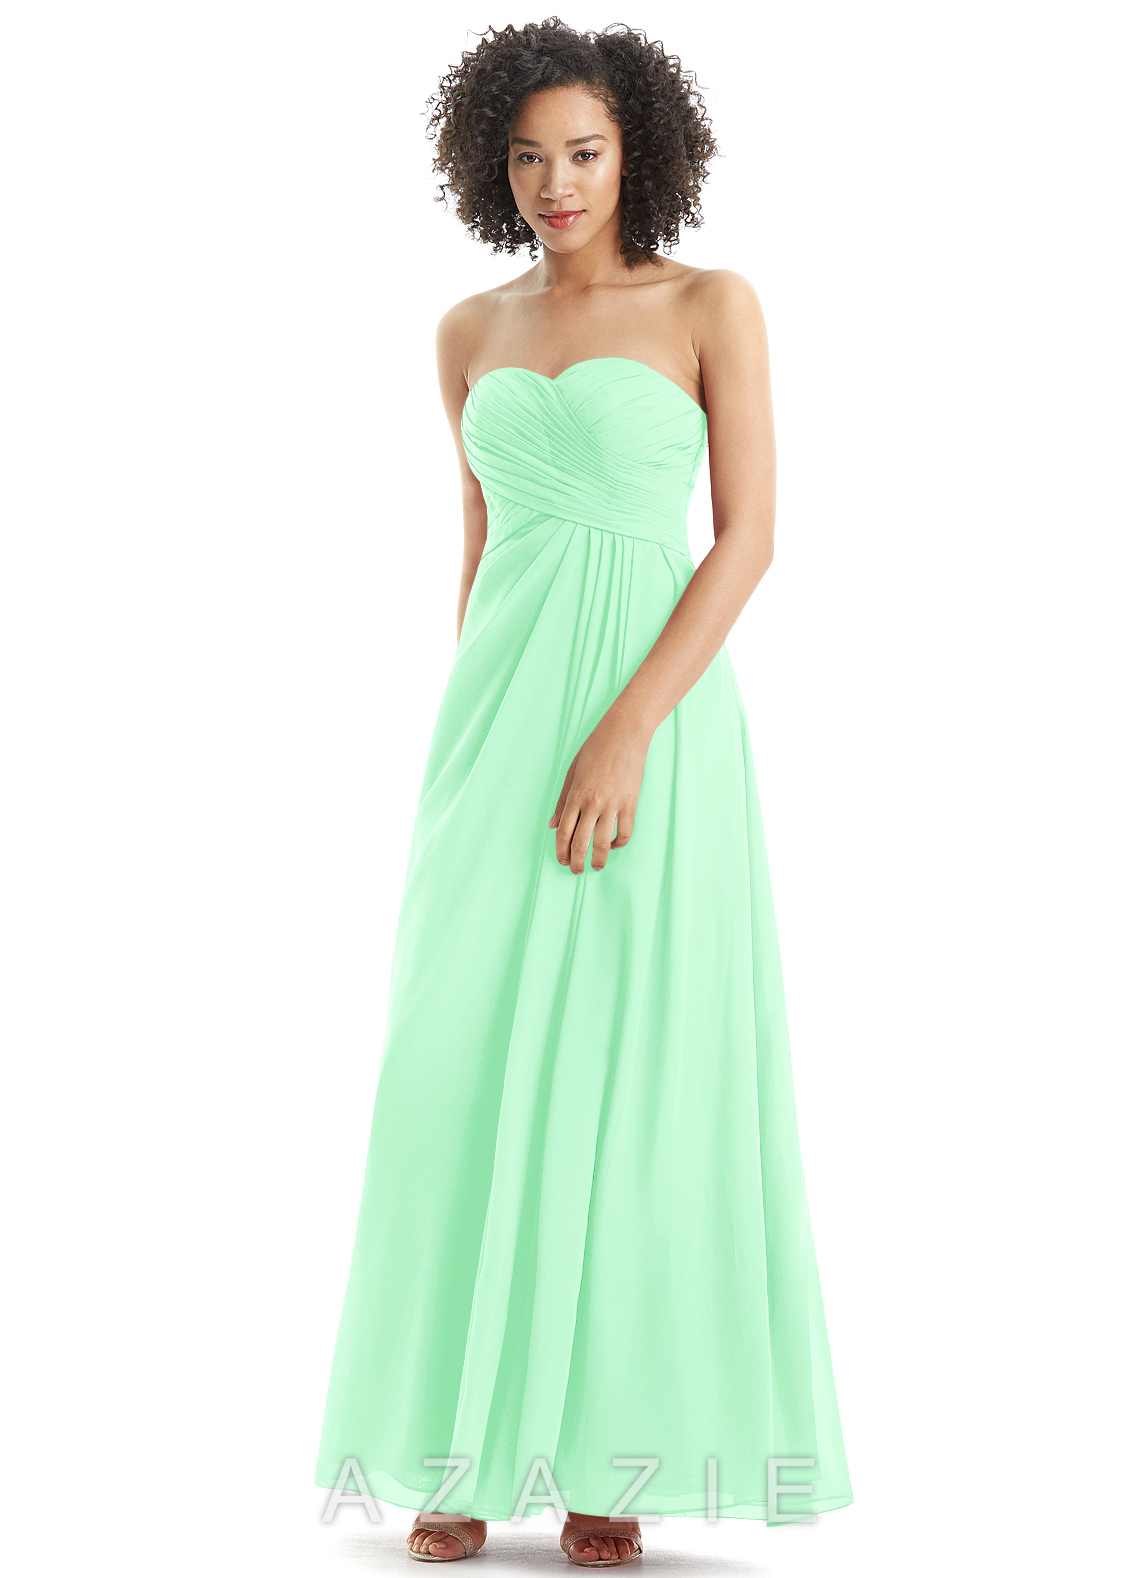 Azazie arabella bridesmaid dress azazie color mint green ombrellifo Choice Image